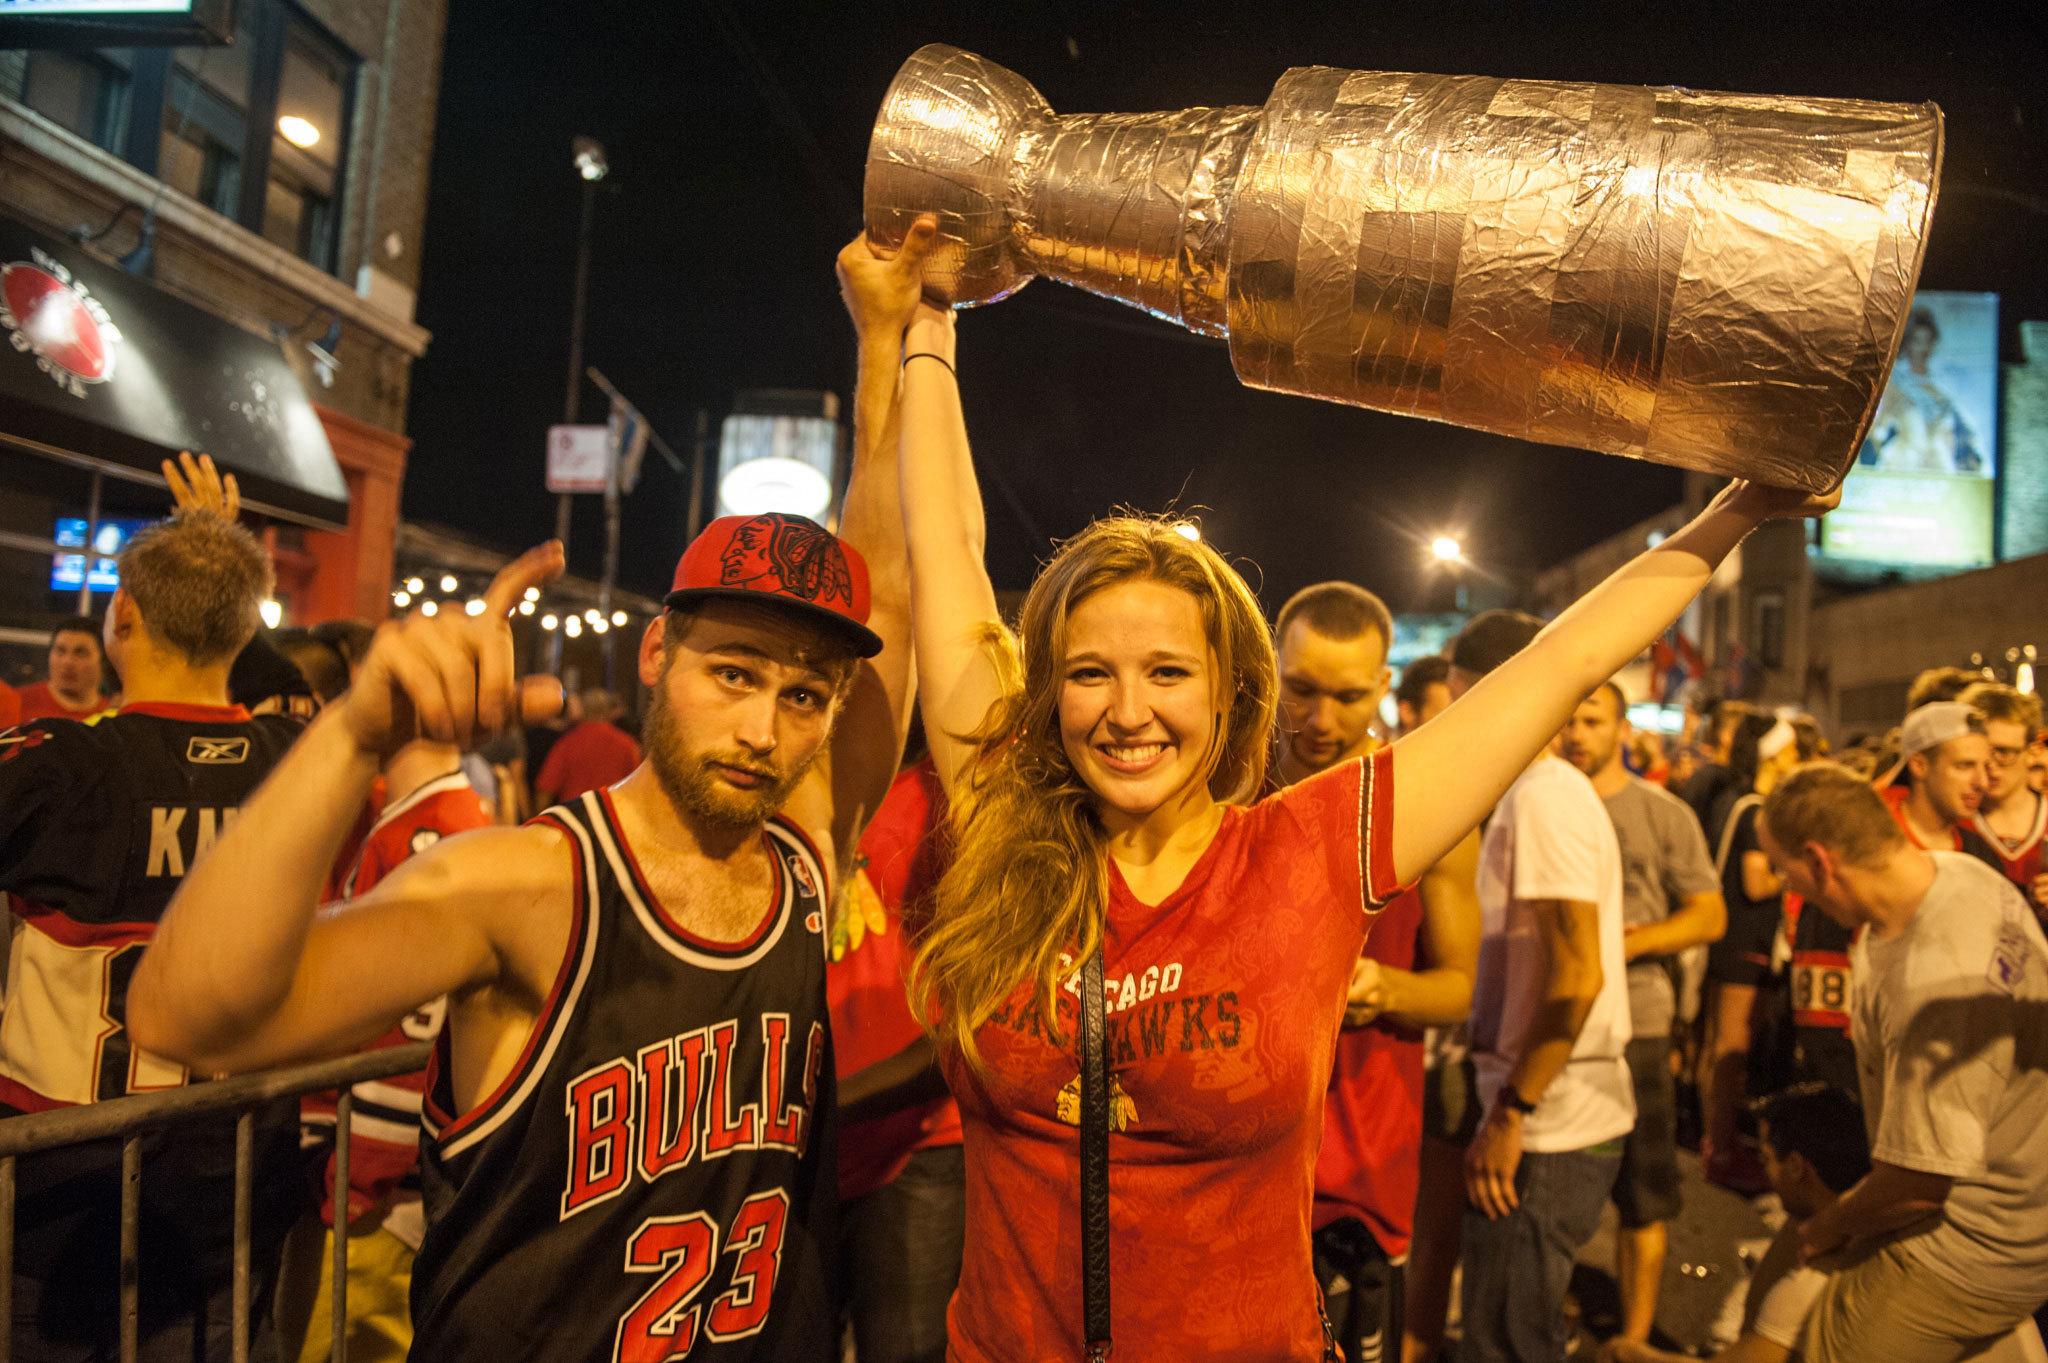 Stanley Cup Celebration 2013